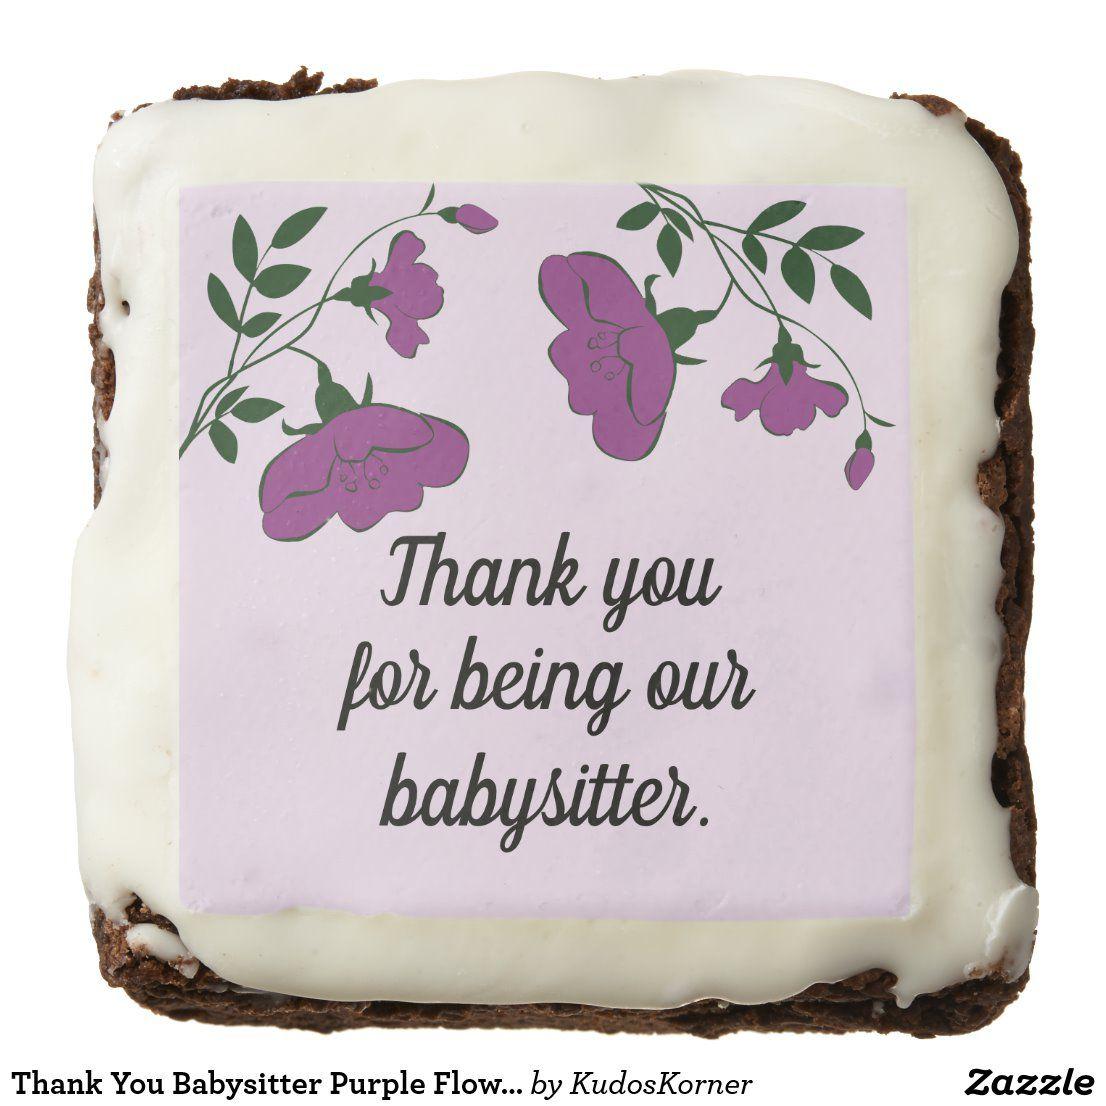 Thank You Babysitter Purple Flowers Appreciation Brownie